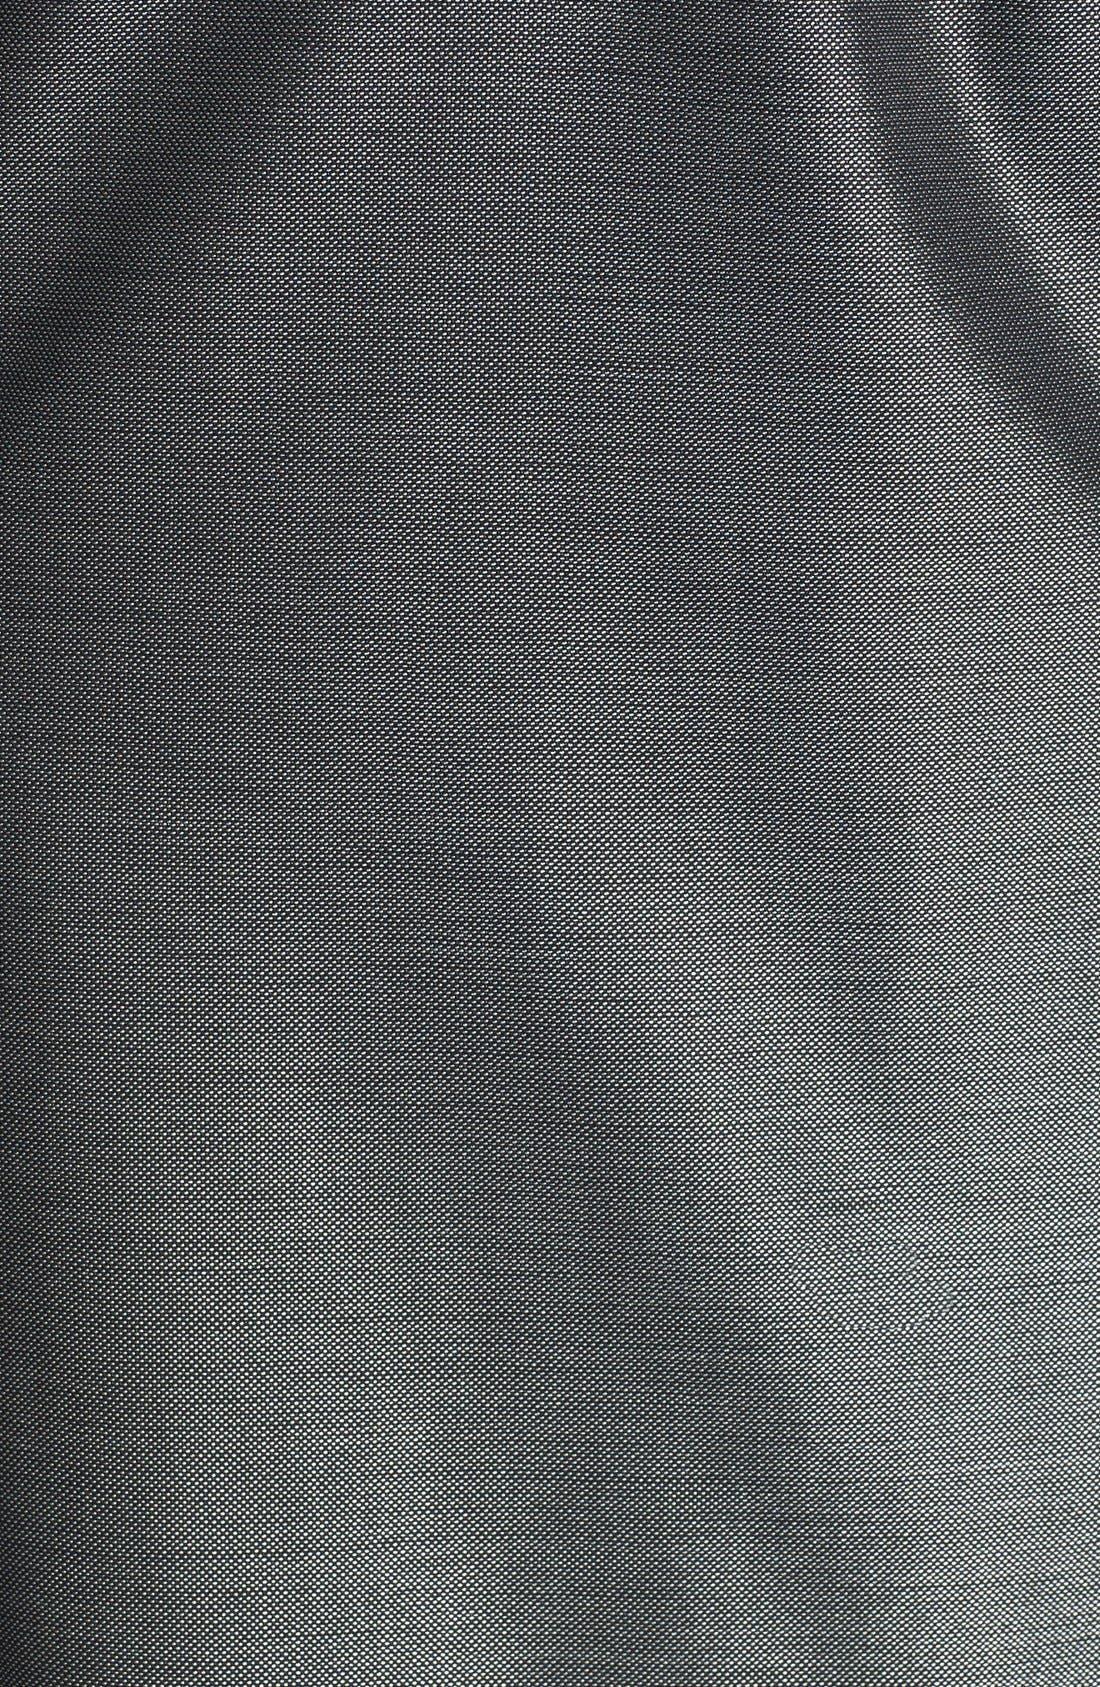 Alternate Image 3  - BOSS HUGO BOSS 'Dipera' Wool Blend Sheath Dress